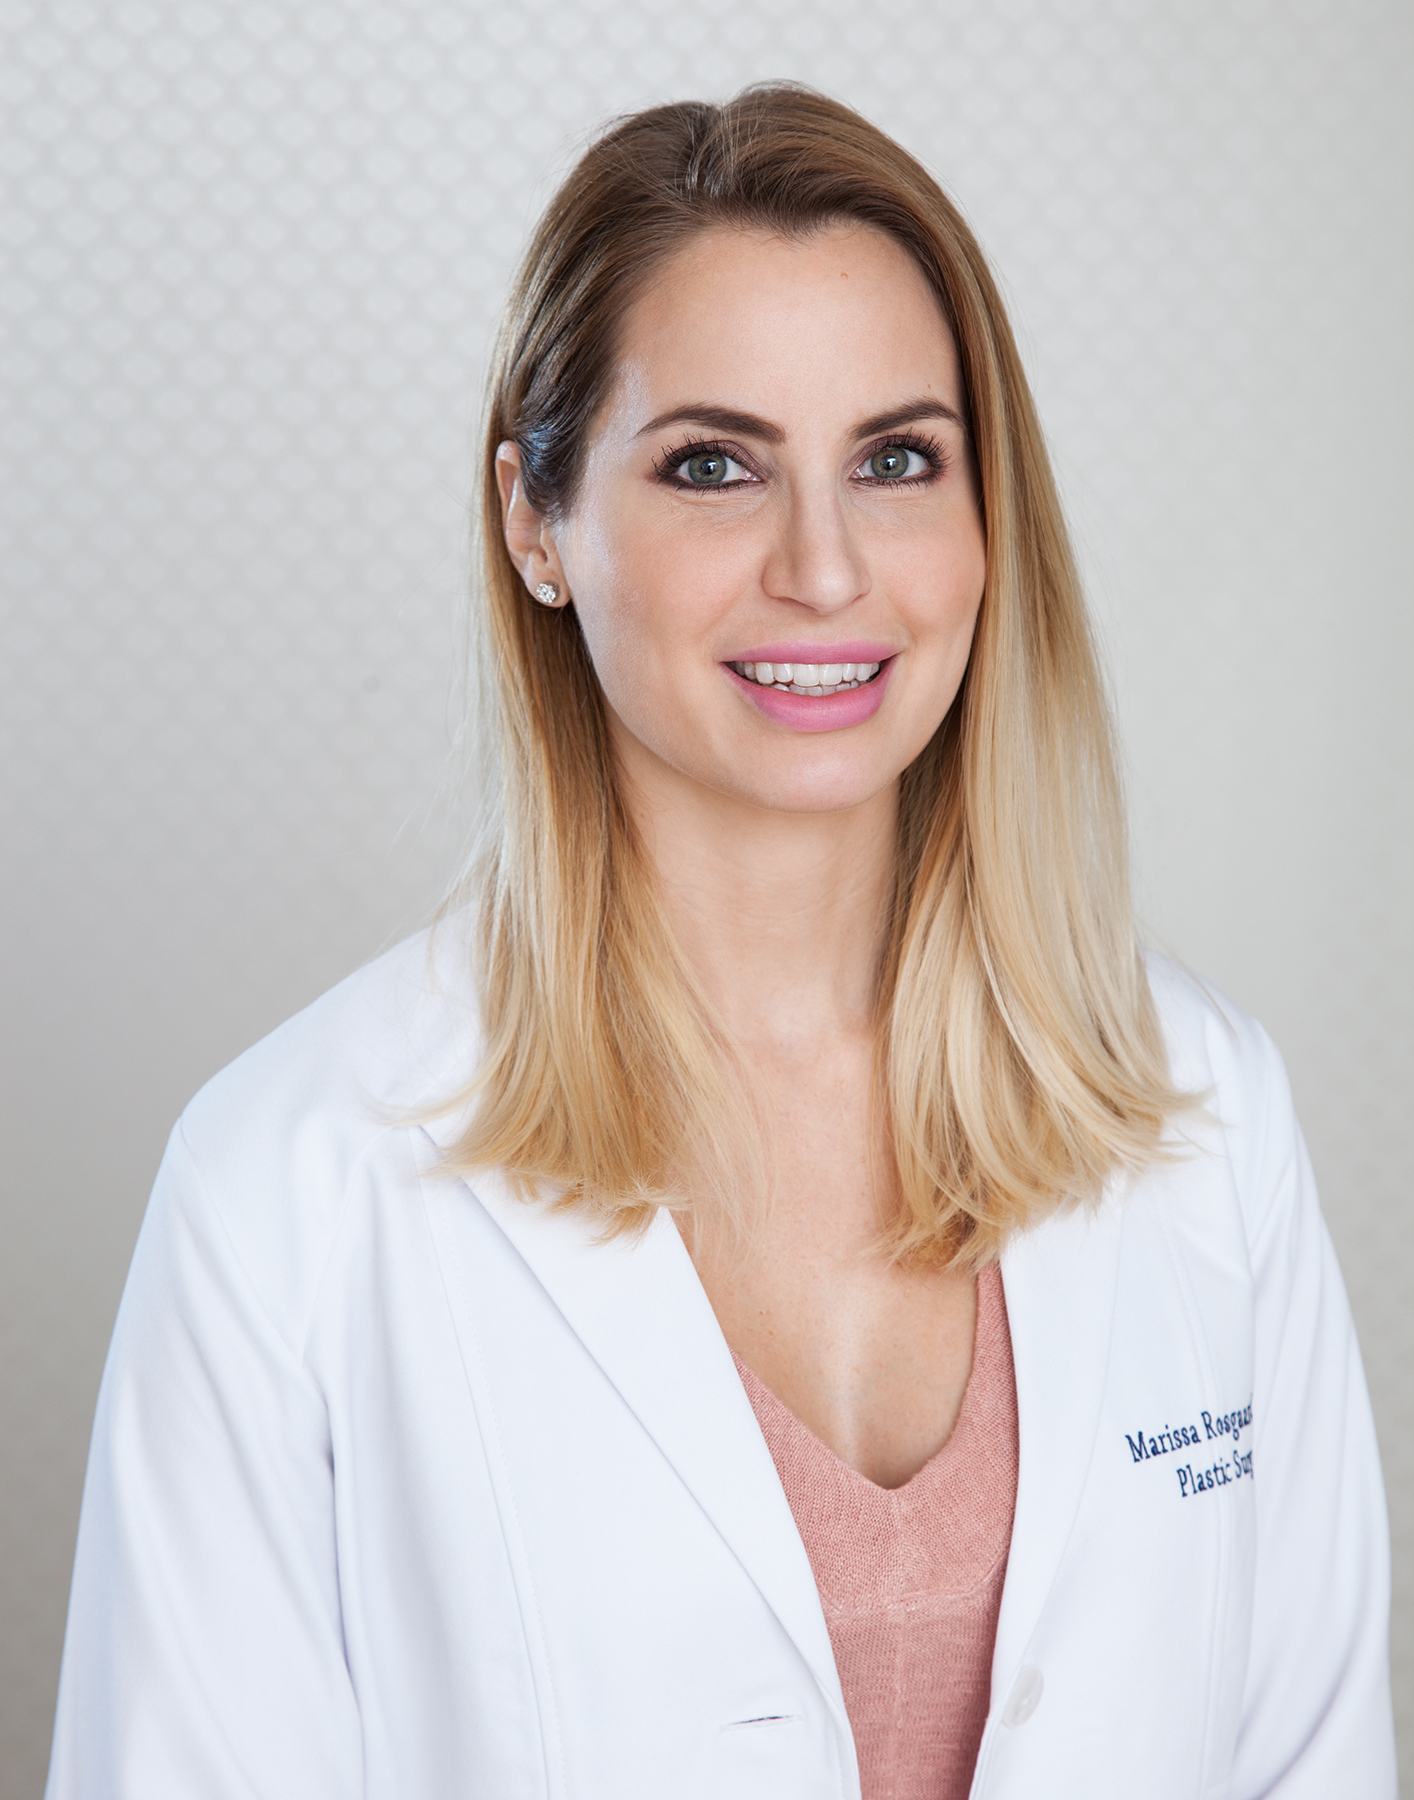 MARISSA ROSGAARD DR. ROMANELLI-COSMETIC-SURGERY--PROFILE-PORTRAITS-BY-JONATHAN-BECKERMAN-PHOTOGRAPHY-LONG-ISLAND_050718_-335 2.jpg